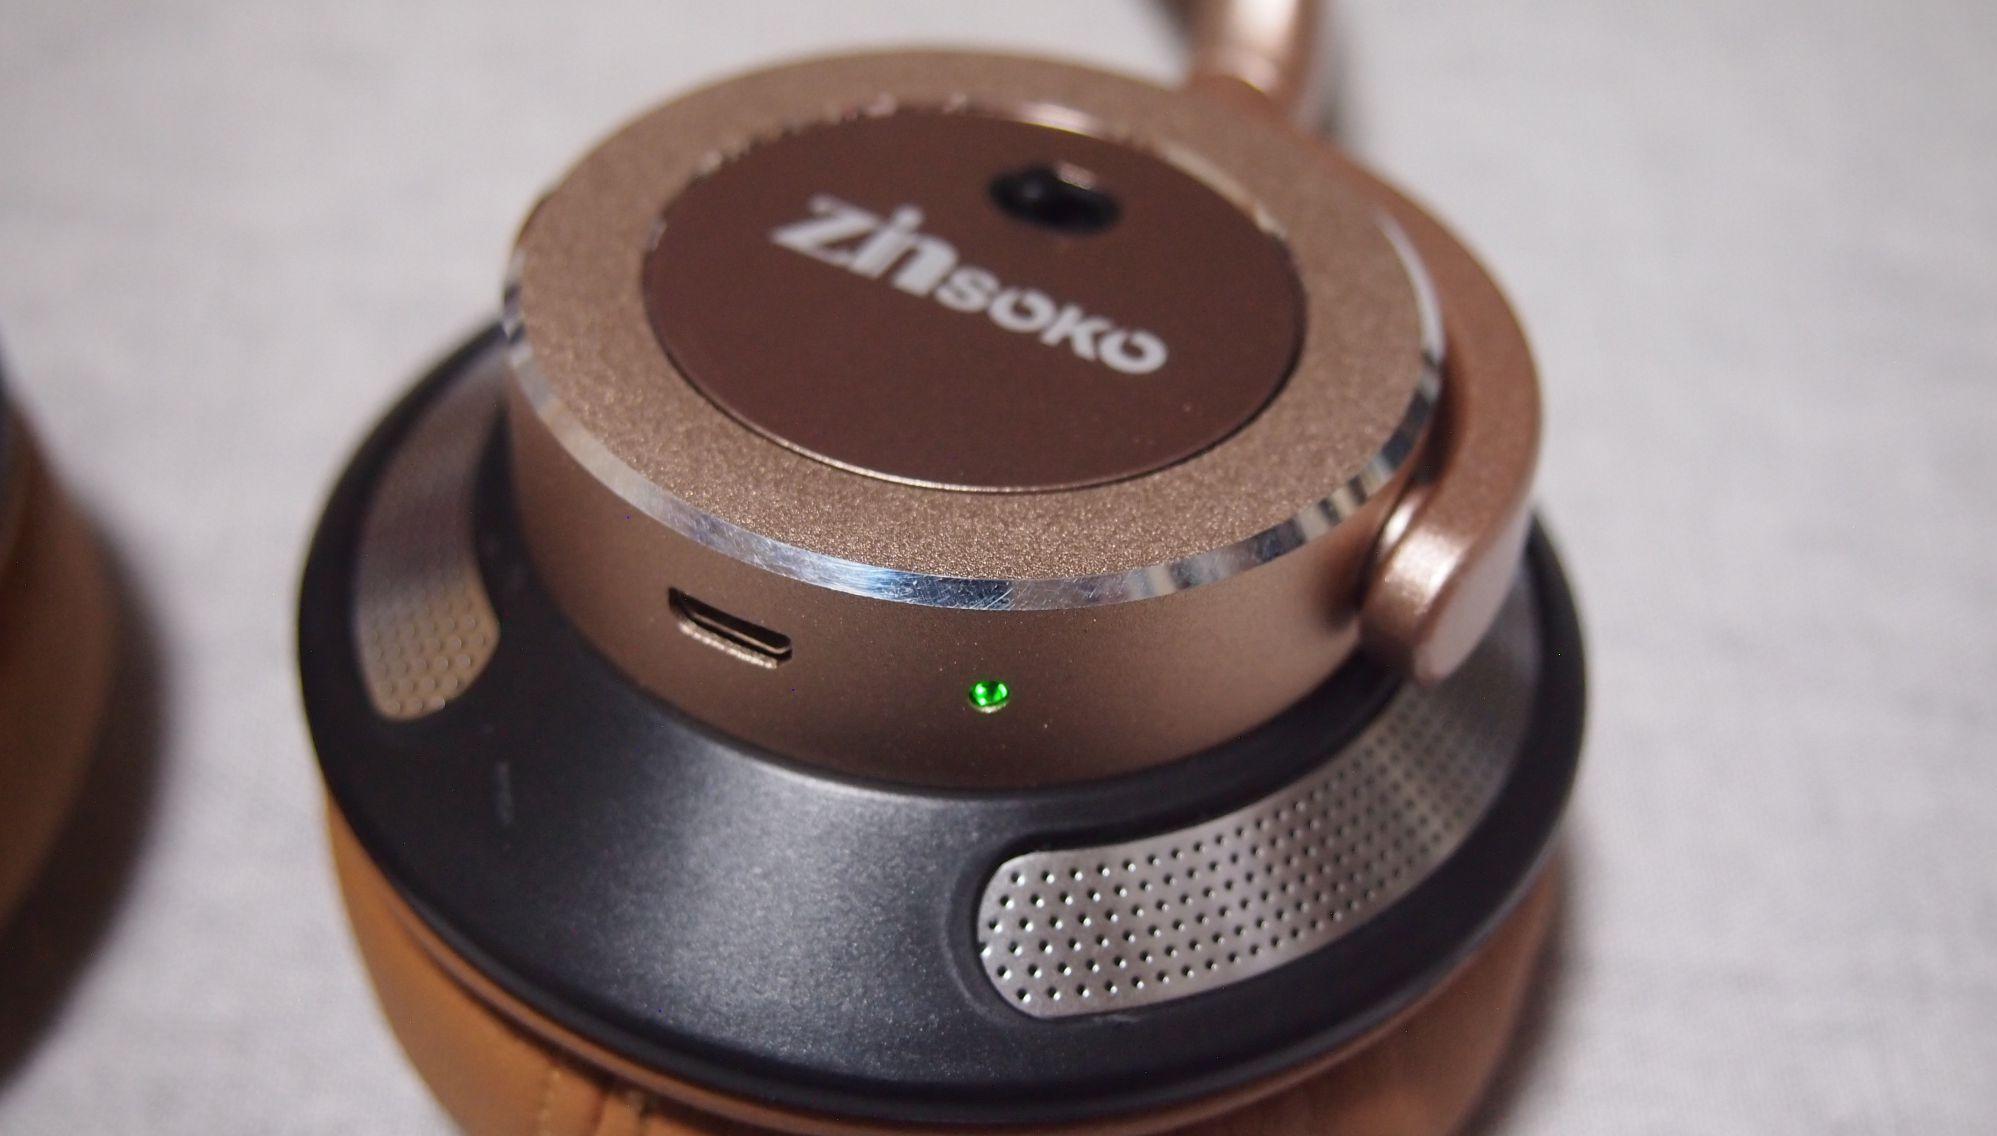 Zinsoko Z-H01 bluetoothヘッドホン ノイズキャンセリング